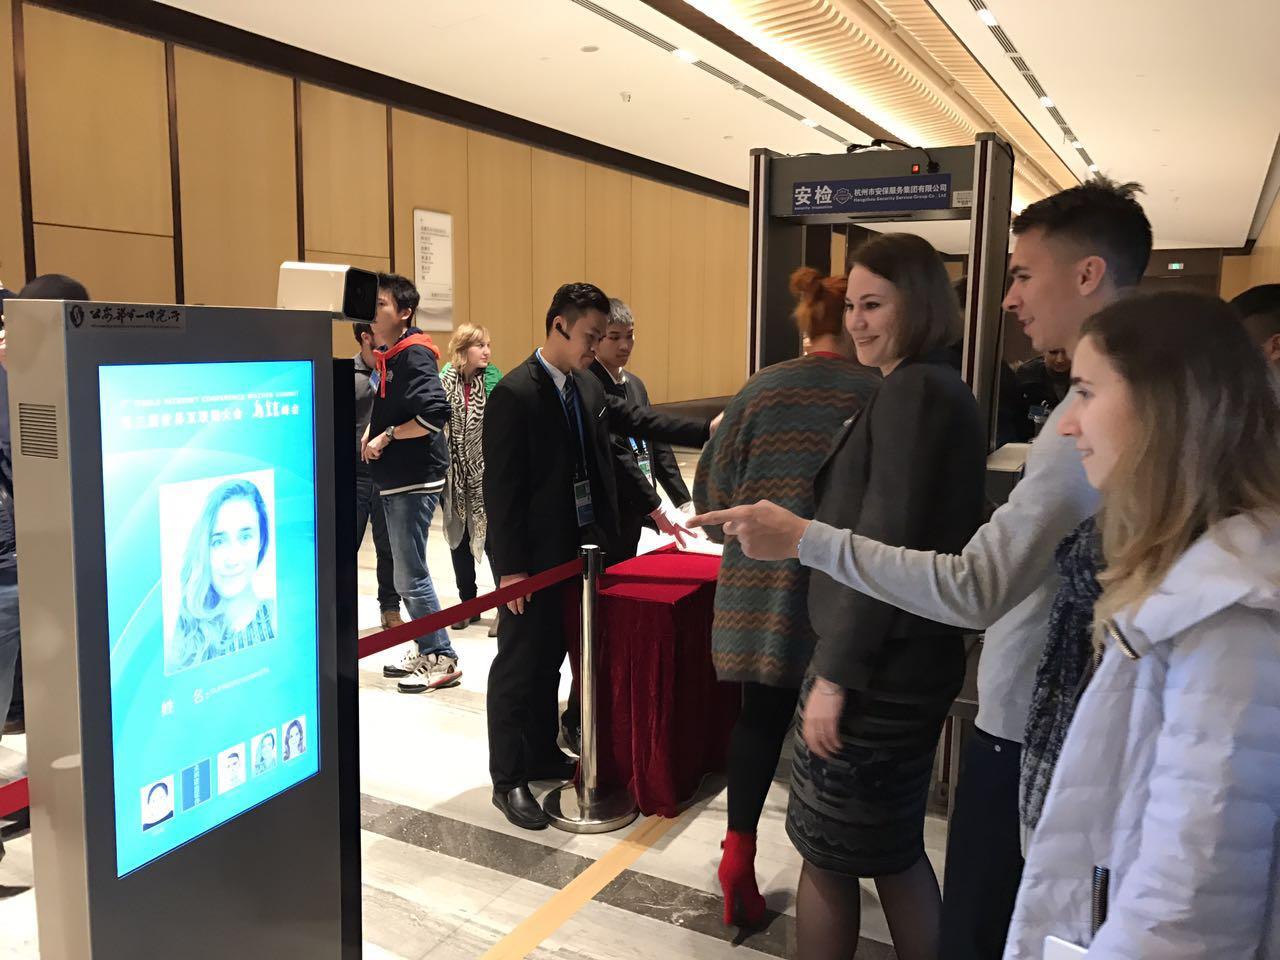 распознавание лиц в китае